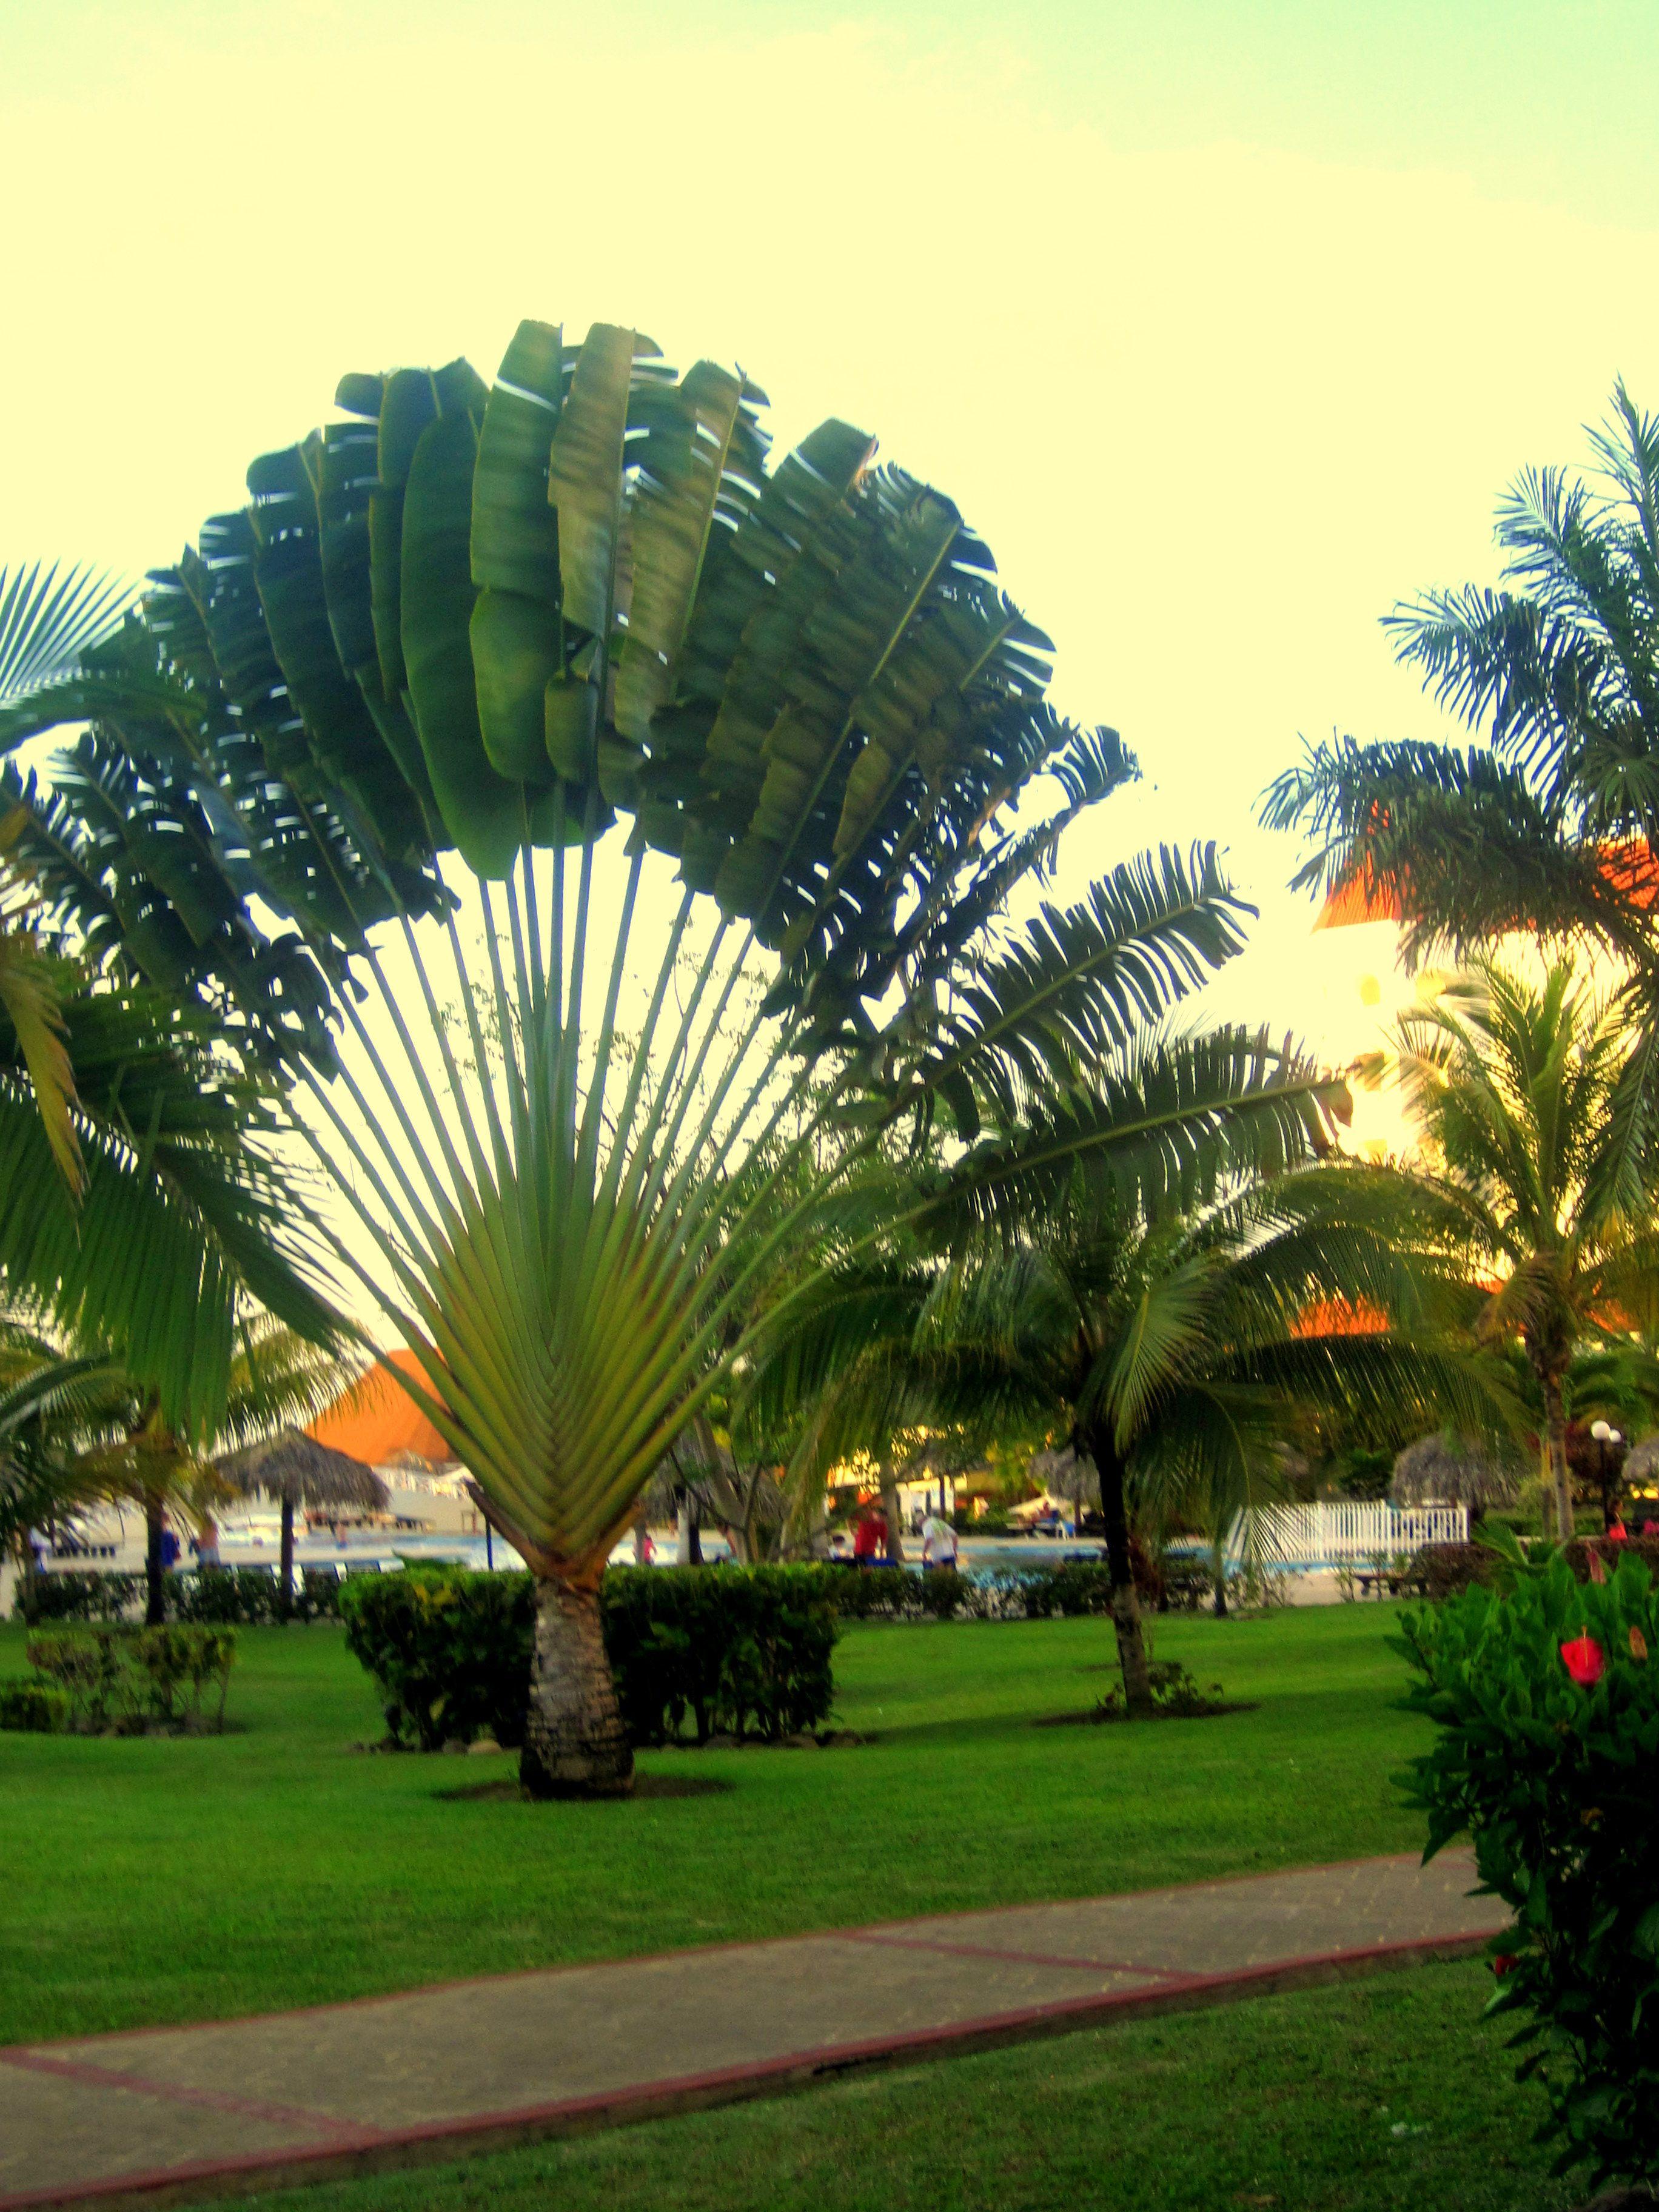 Jamaica I Love These Fan Trees Plantas Jardim Decoracao